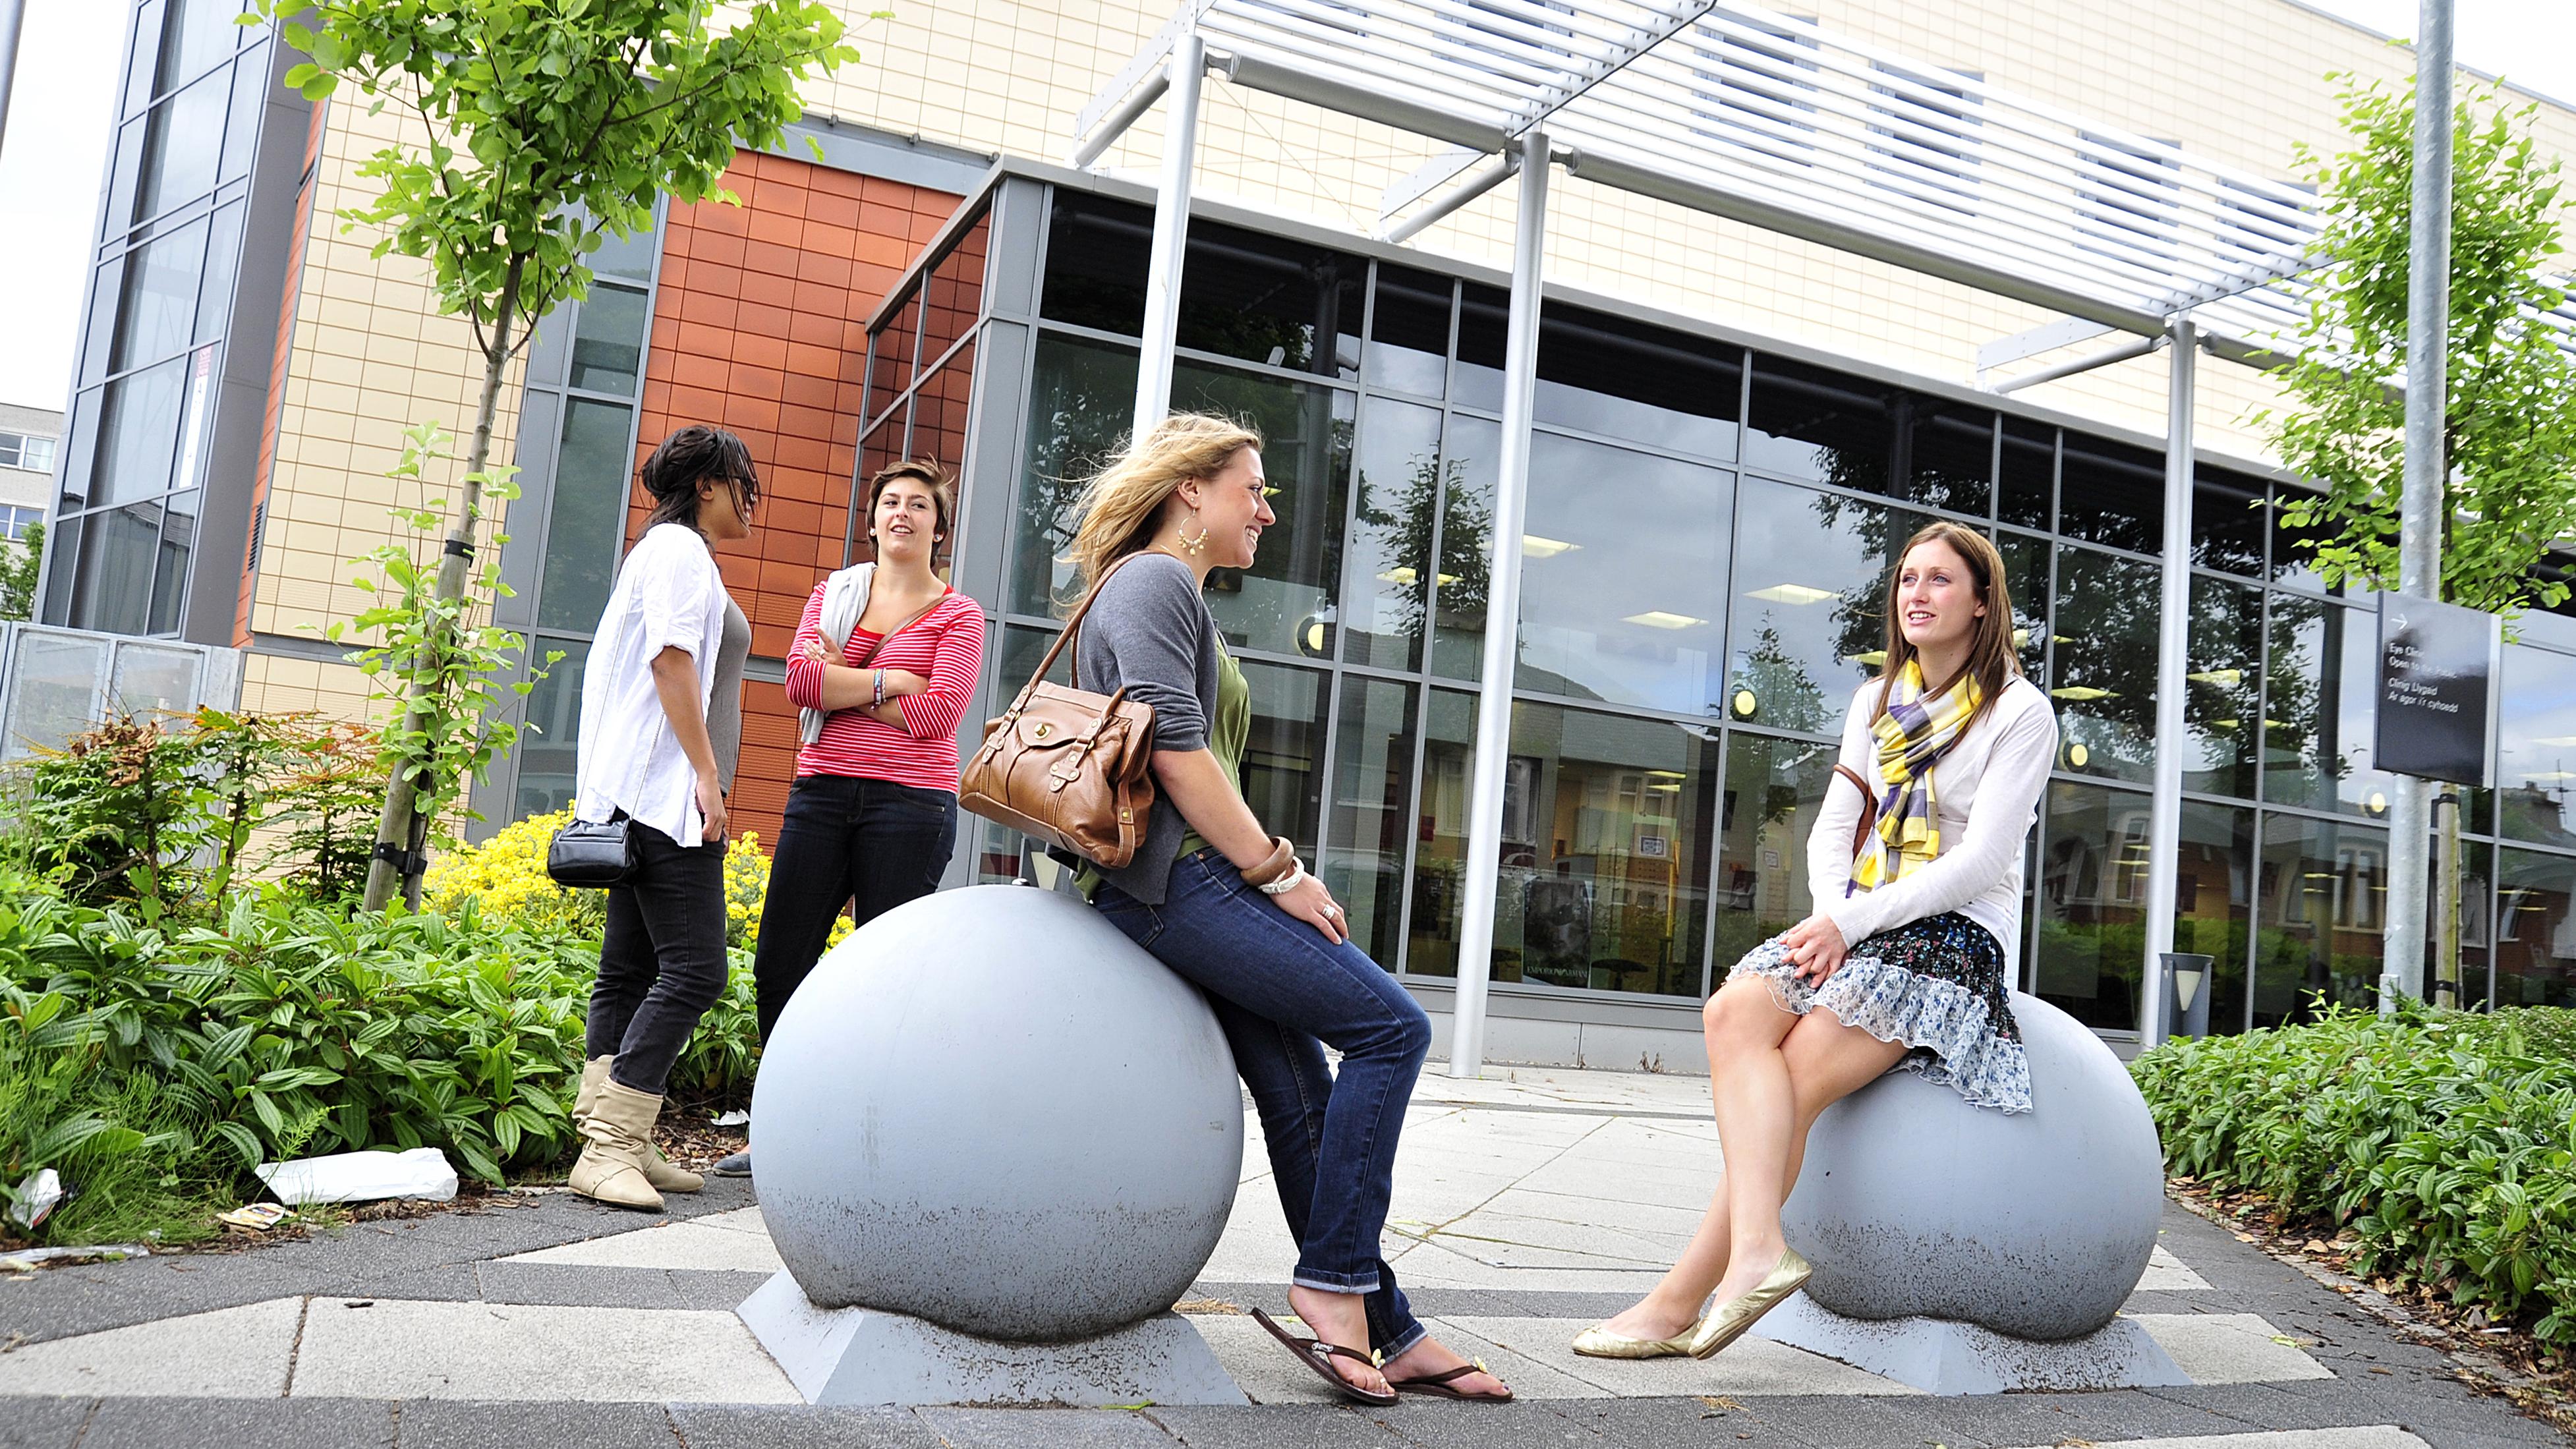 Cardiff University Dissertation Guidance